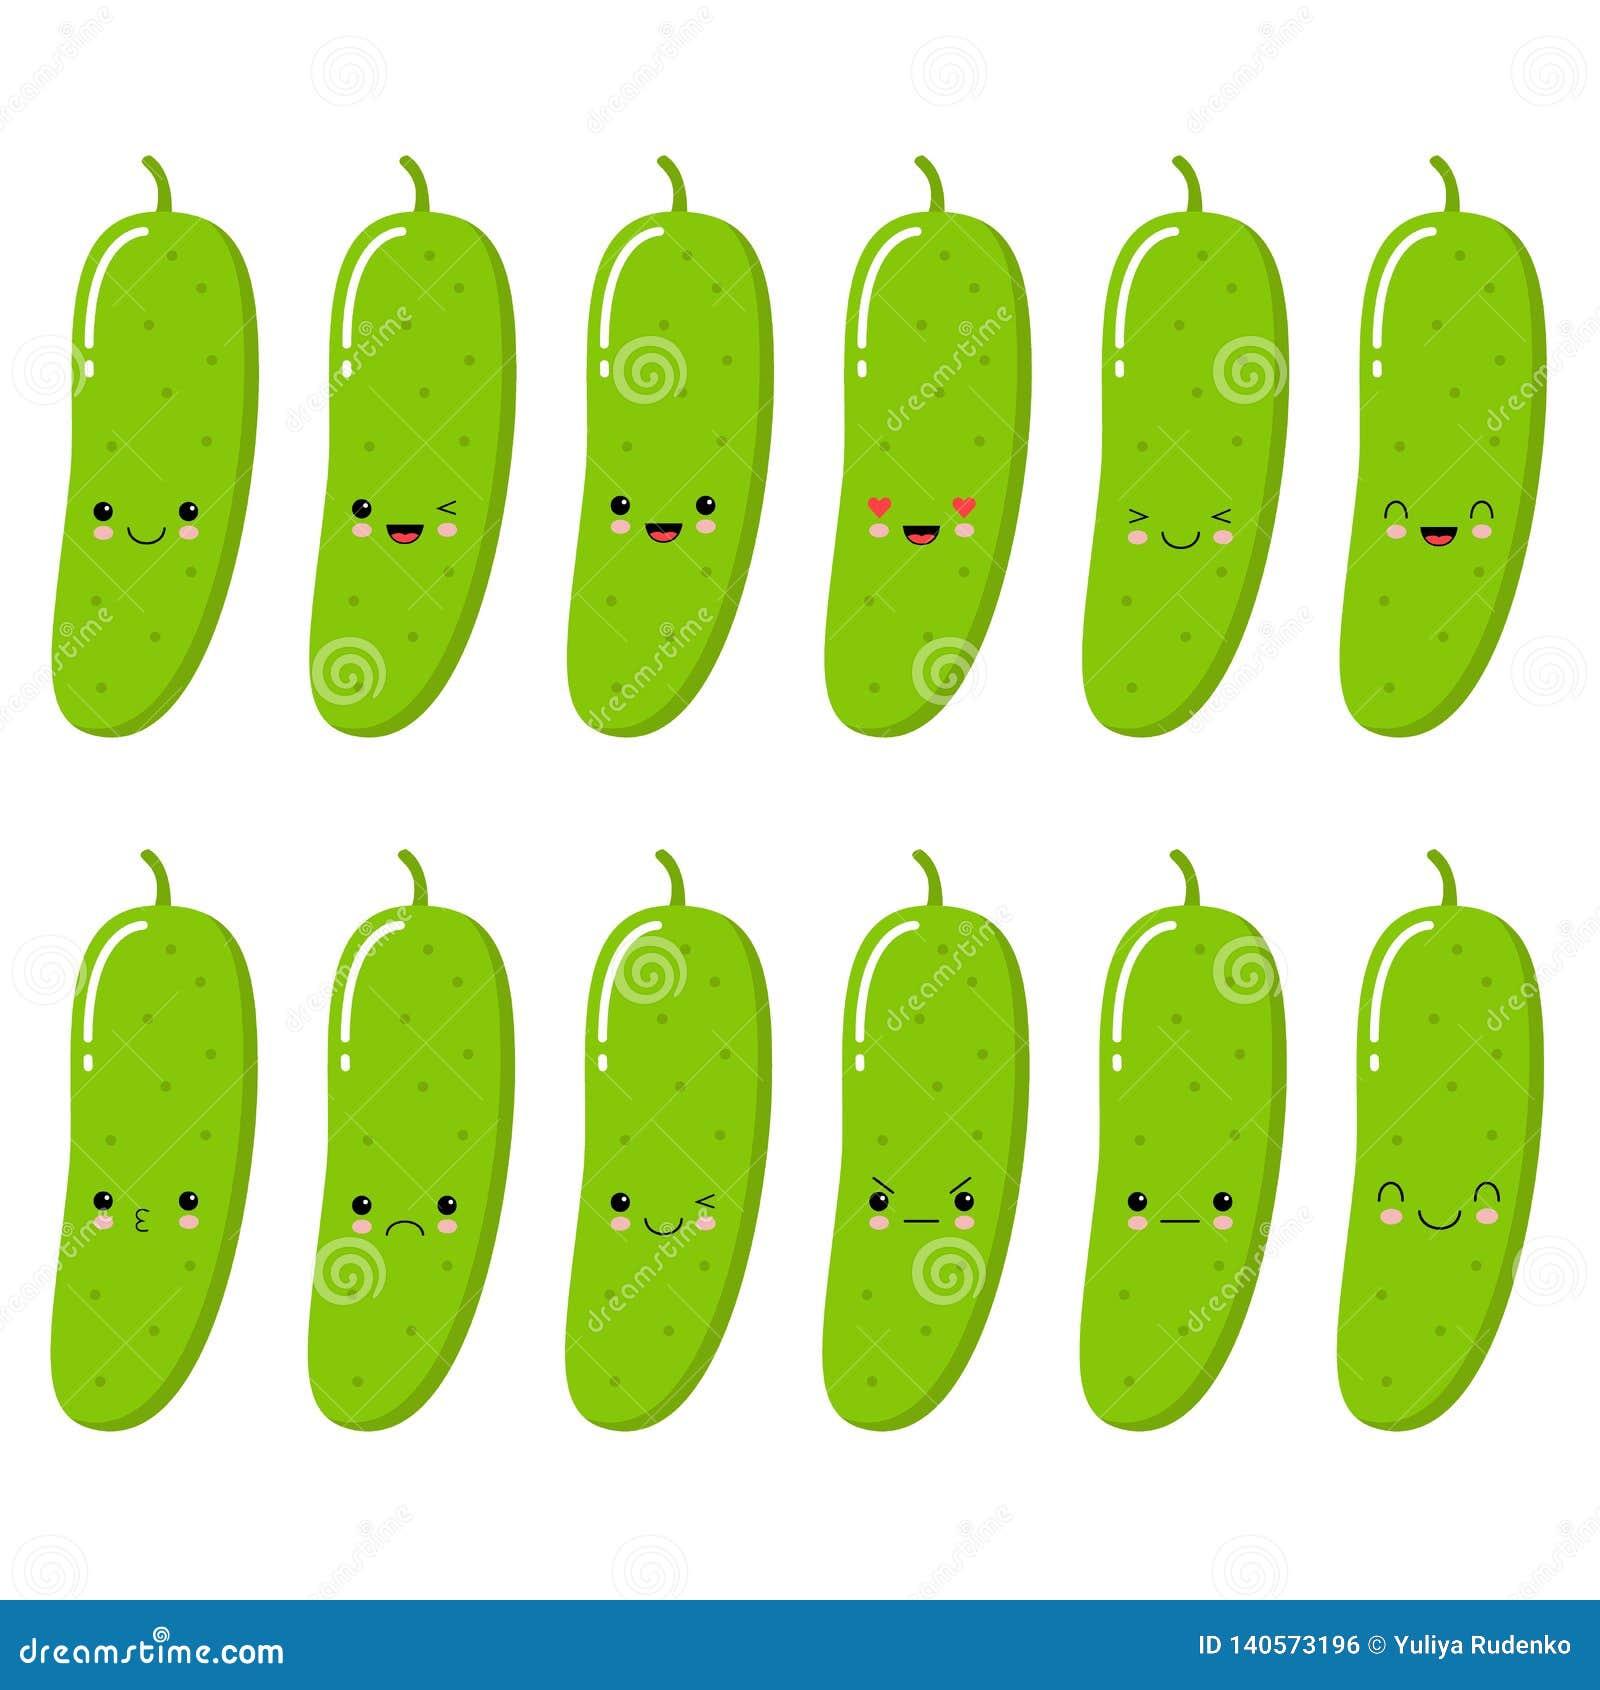 Komkommer Plantaardig Voedselconcept De inzameling van Emojiemoticon Kawaiistijl